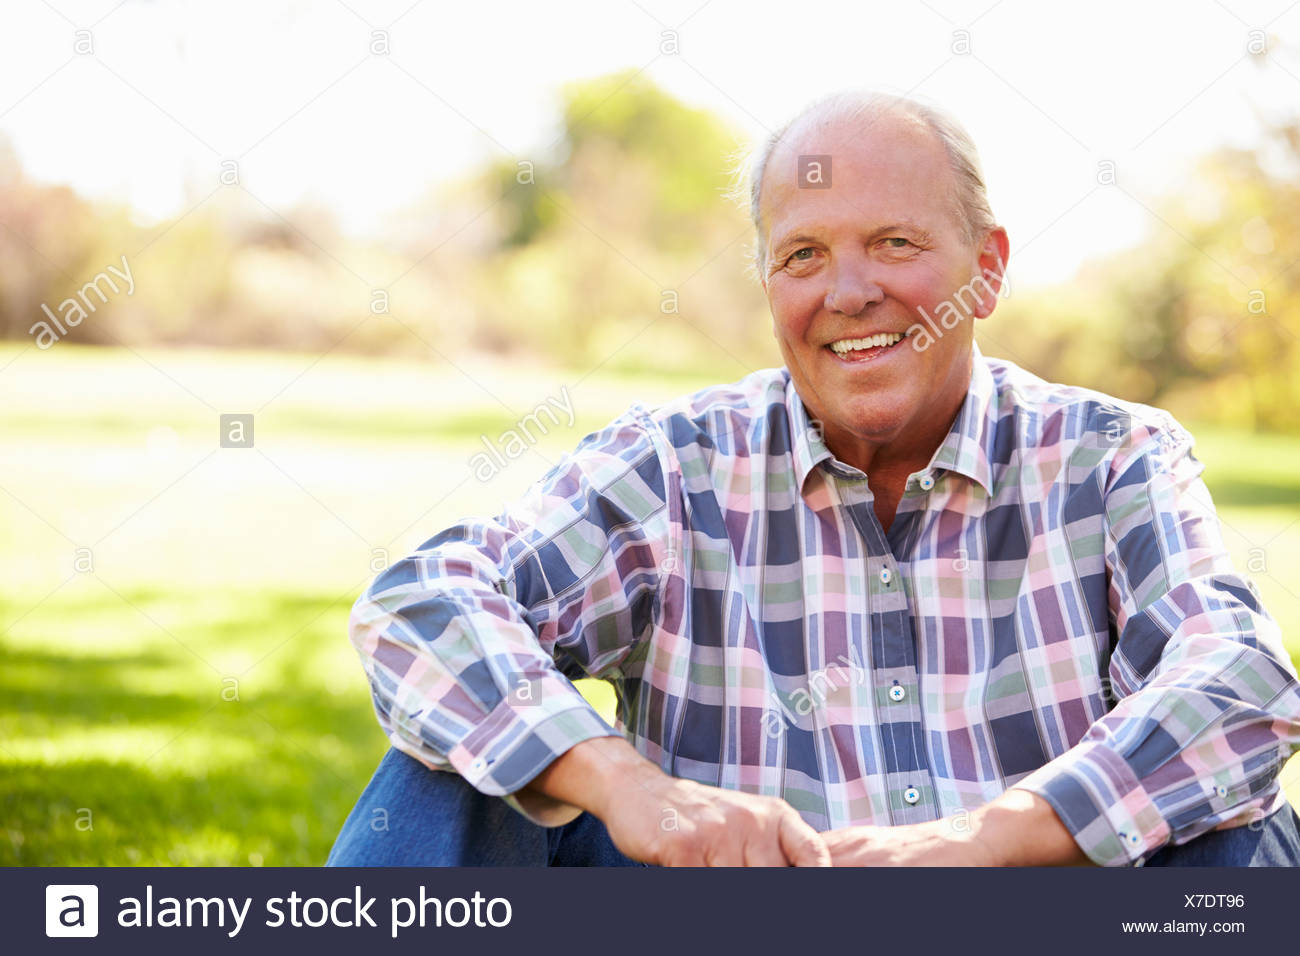 Hombre senior en relajante paisaje otoñal Imagen De Stock